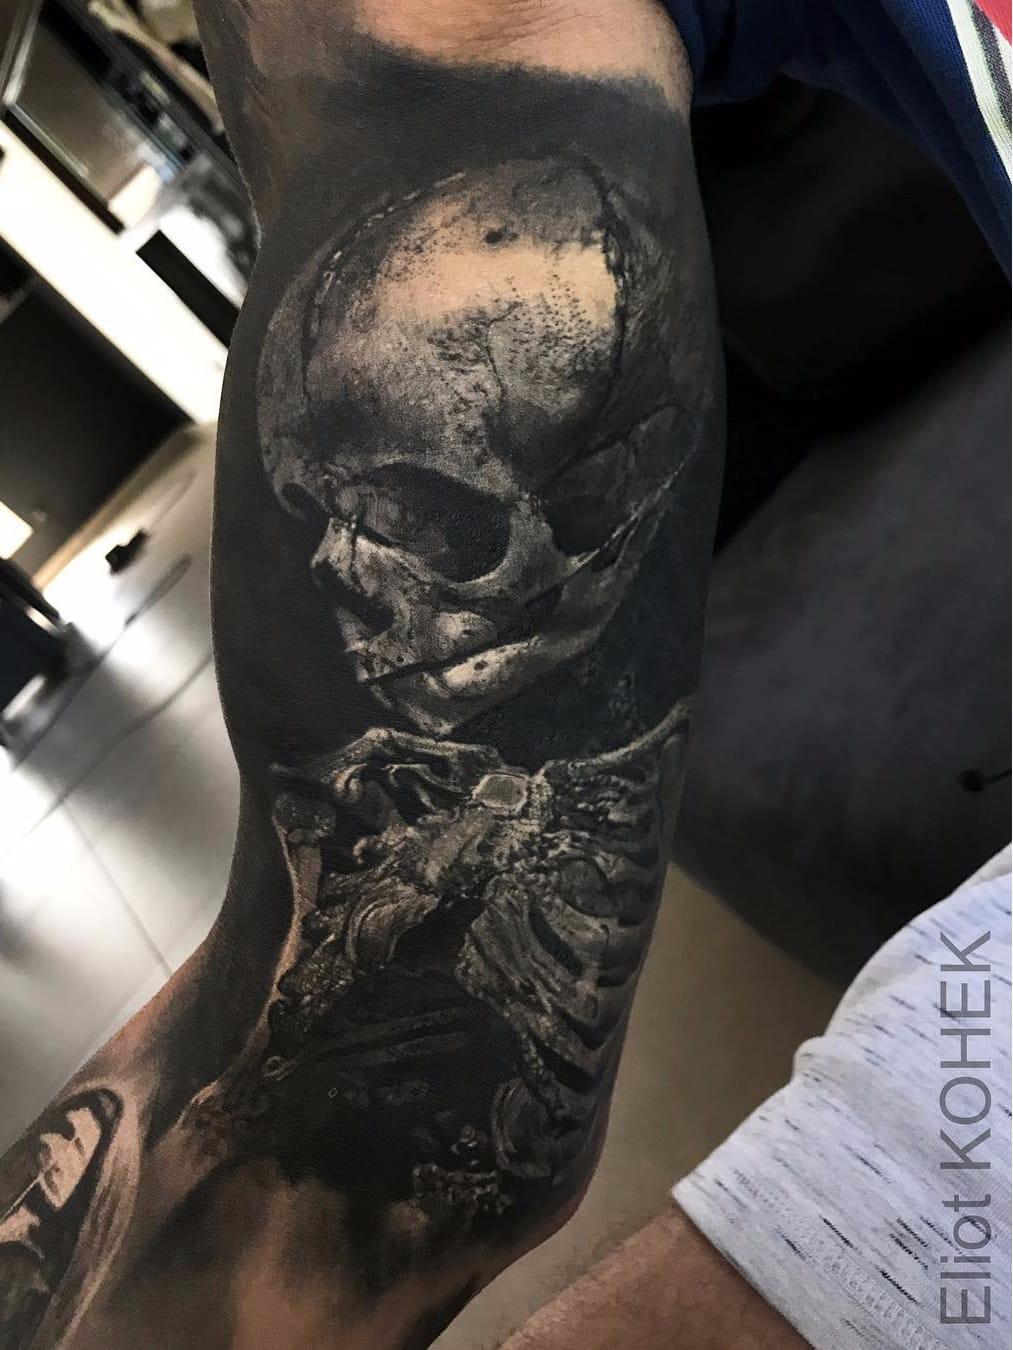 Por Eliot Kohek #EliotKohek #gringo #realismo #realism #pretoecinza #blackandgrey #skull #caveira #esqueleto #skeleton #ossos #bones #dark #terror #horror